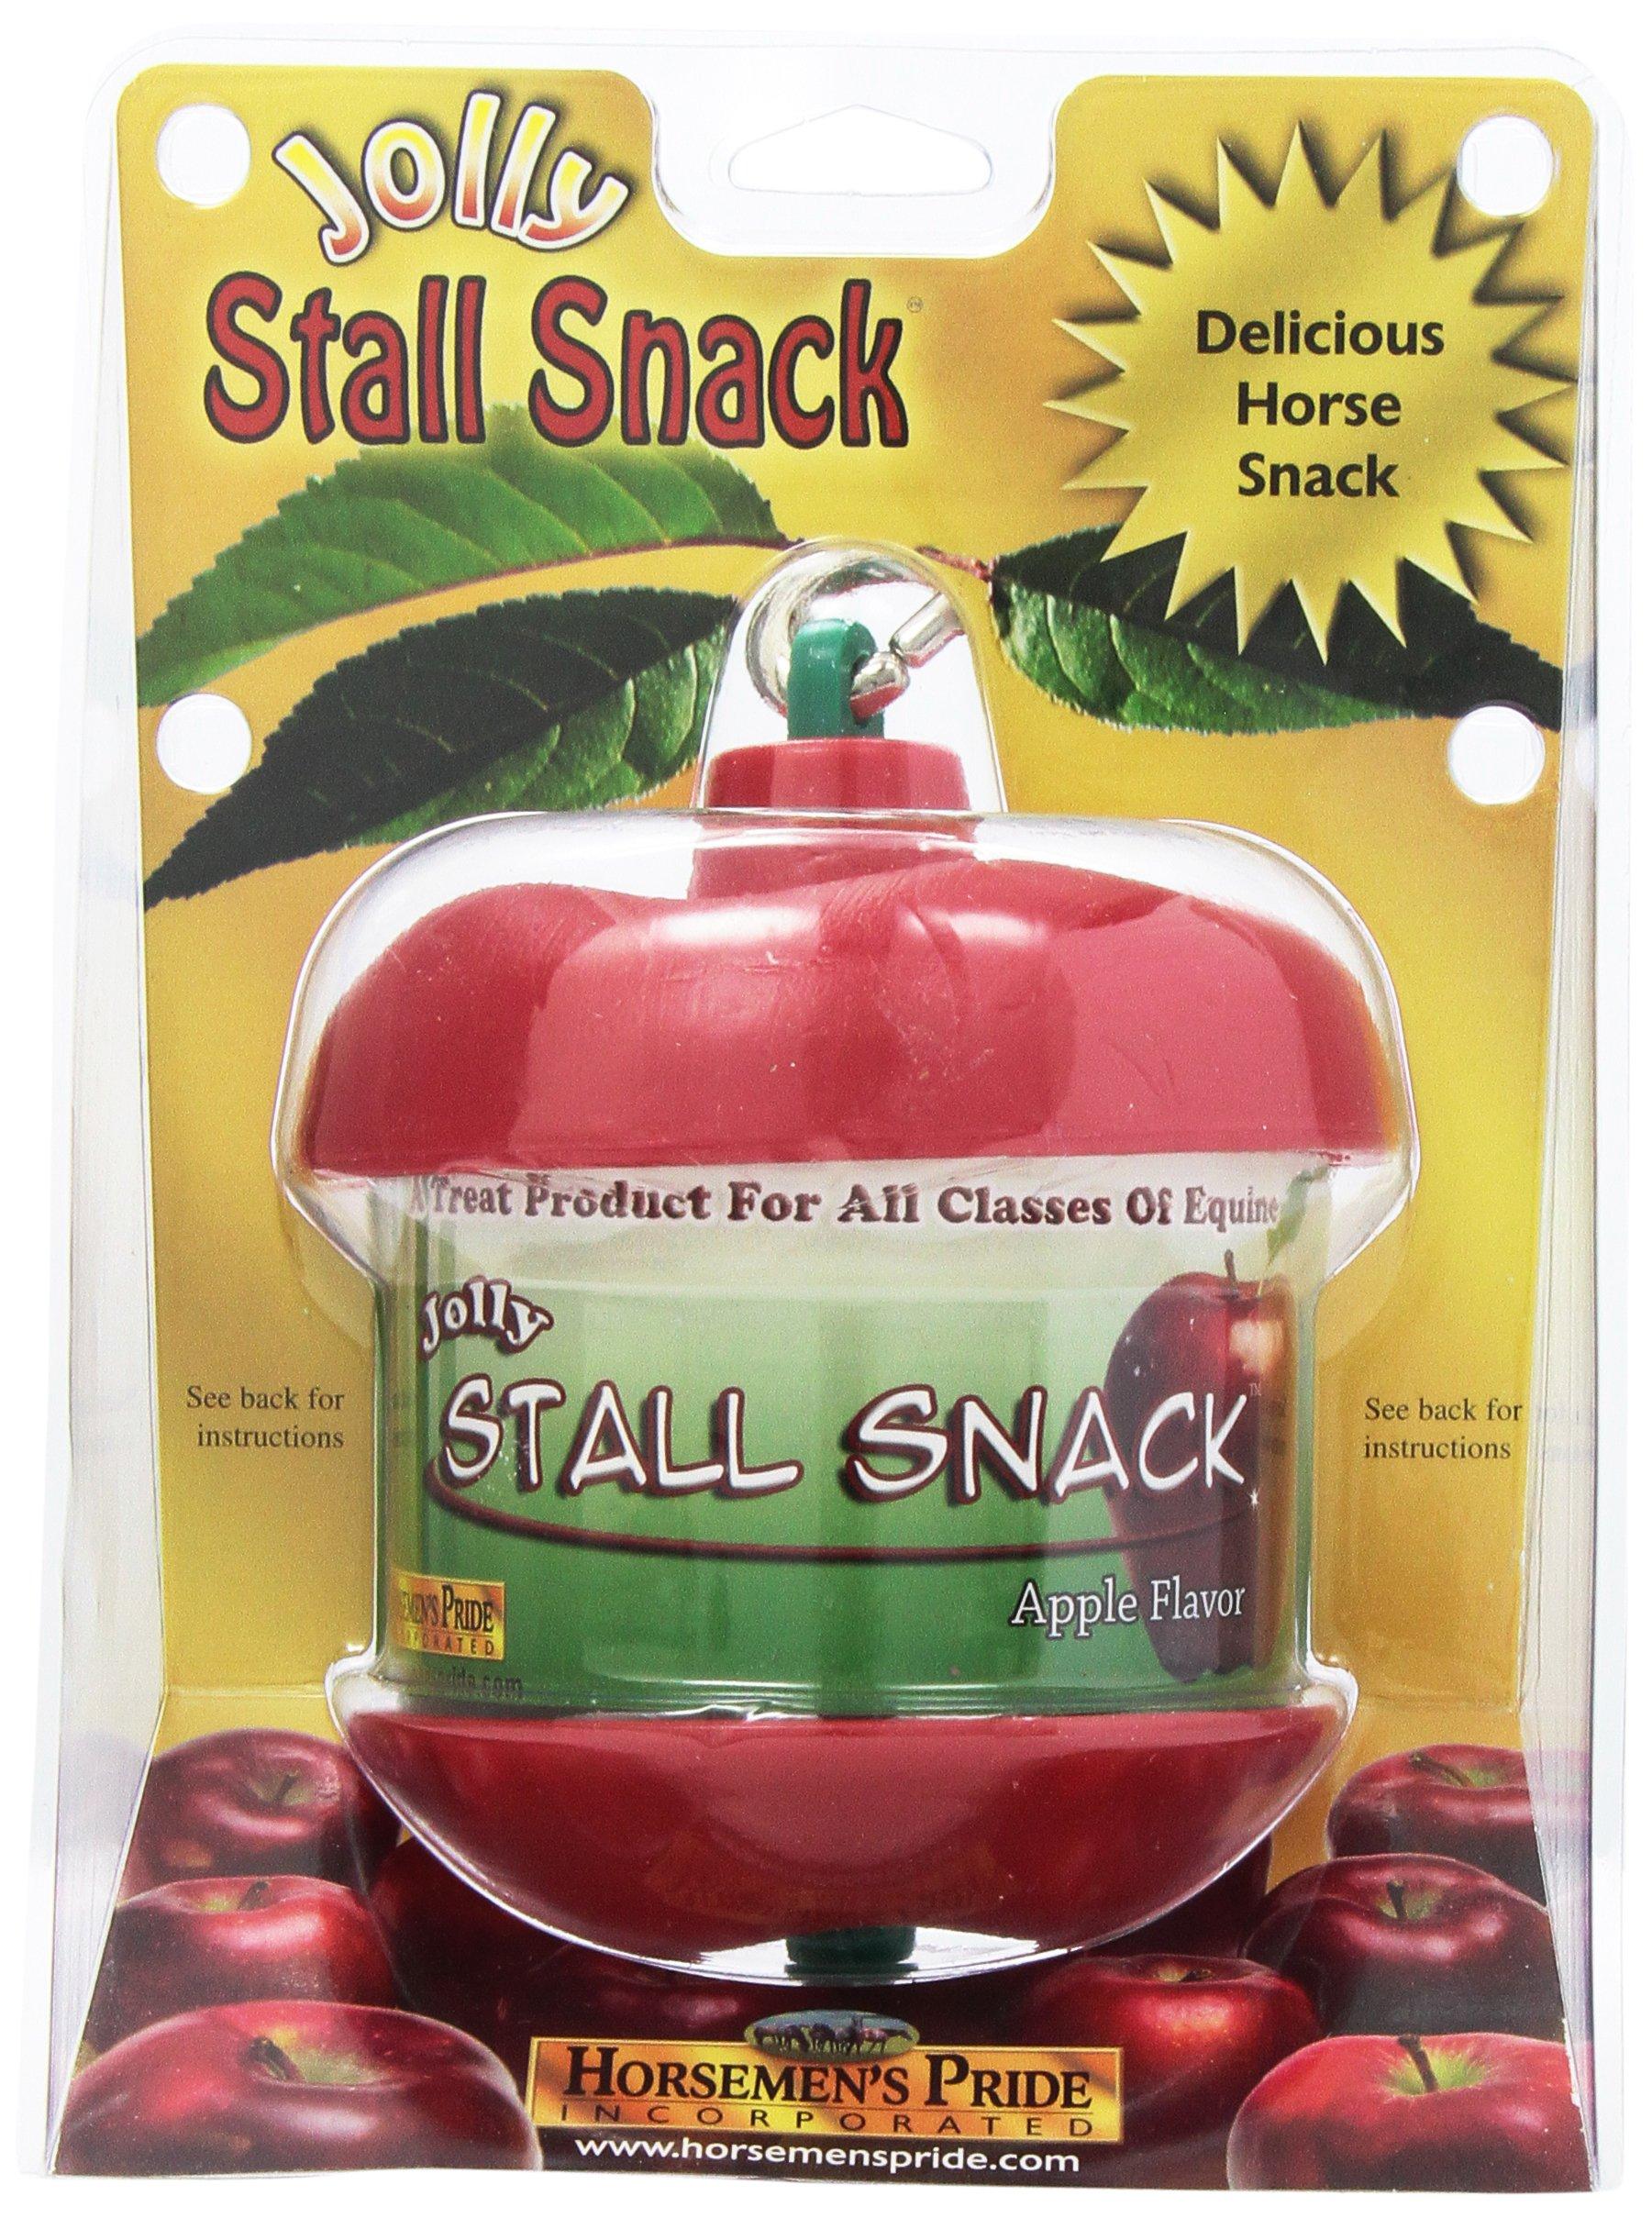 Horsemen's Pride Stall Snack Holder with Apple flavored refill by Horsemen's Pride (Image #1)